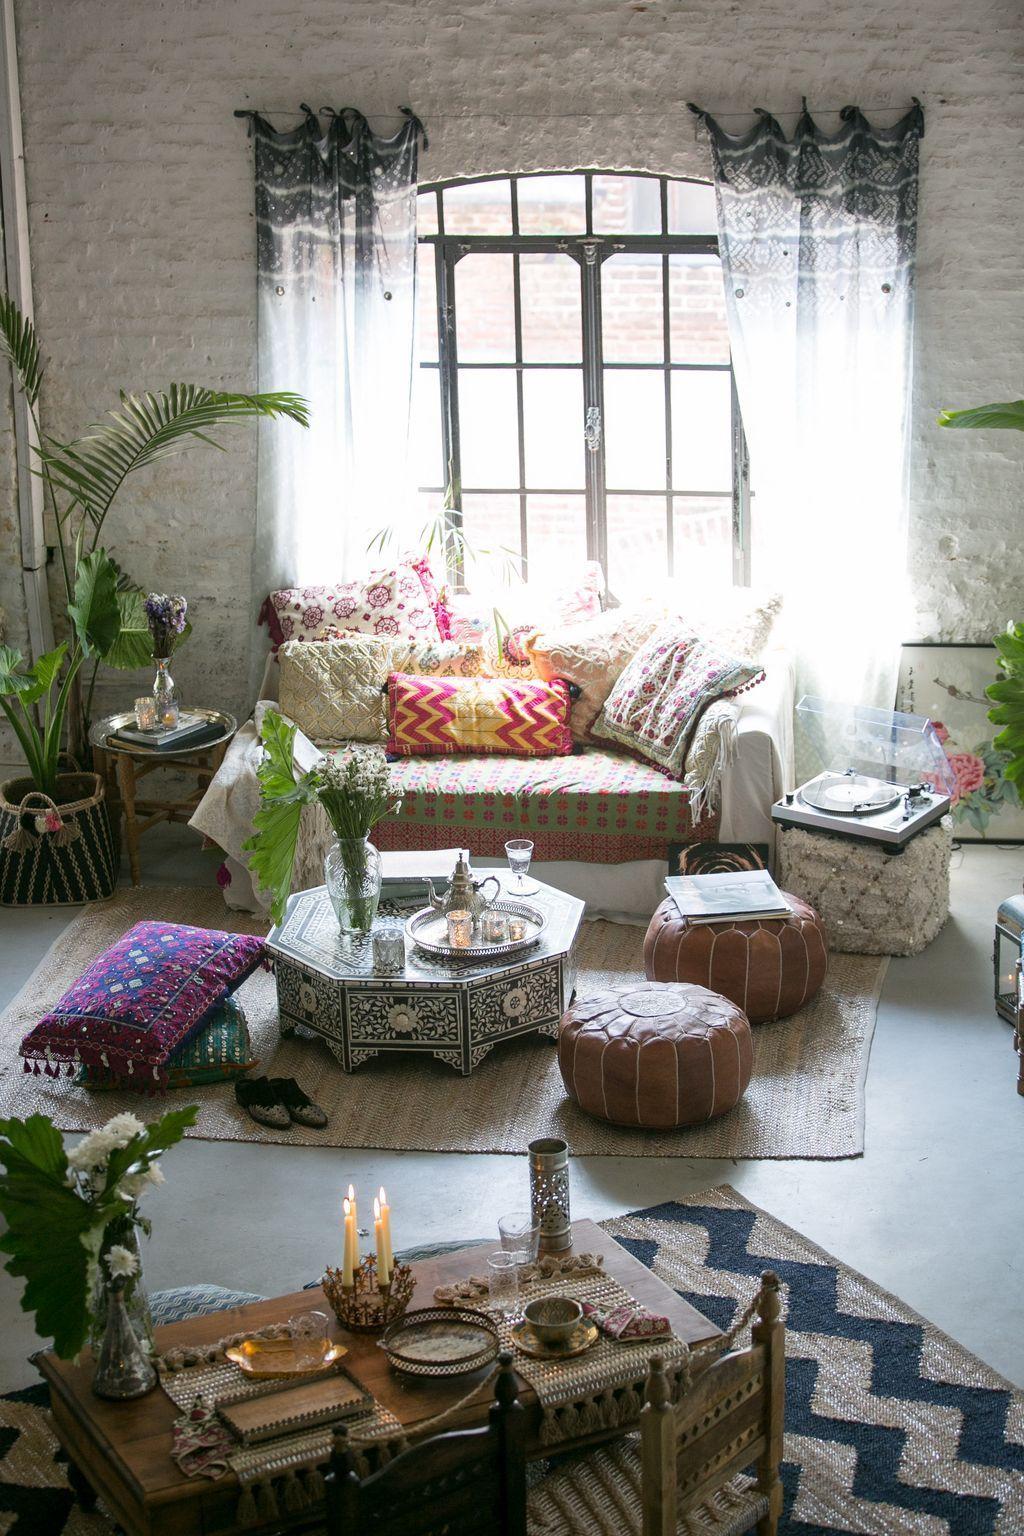 Rustic Boho Living Room Ideas: 90+ Modern Rustic Bohemian Living Room Design Ideas